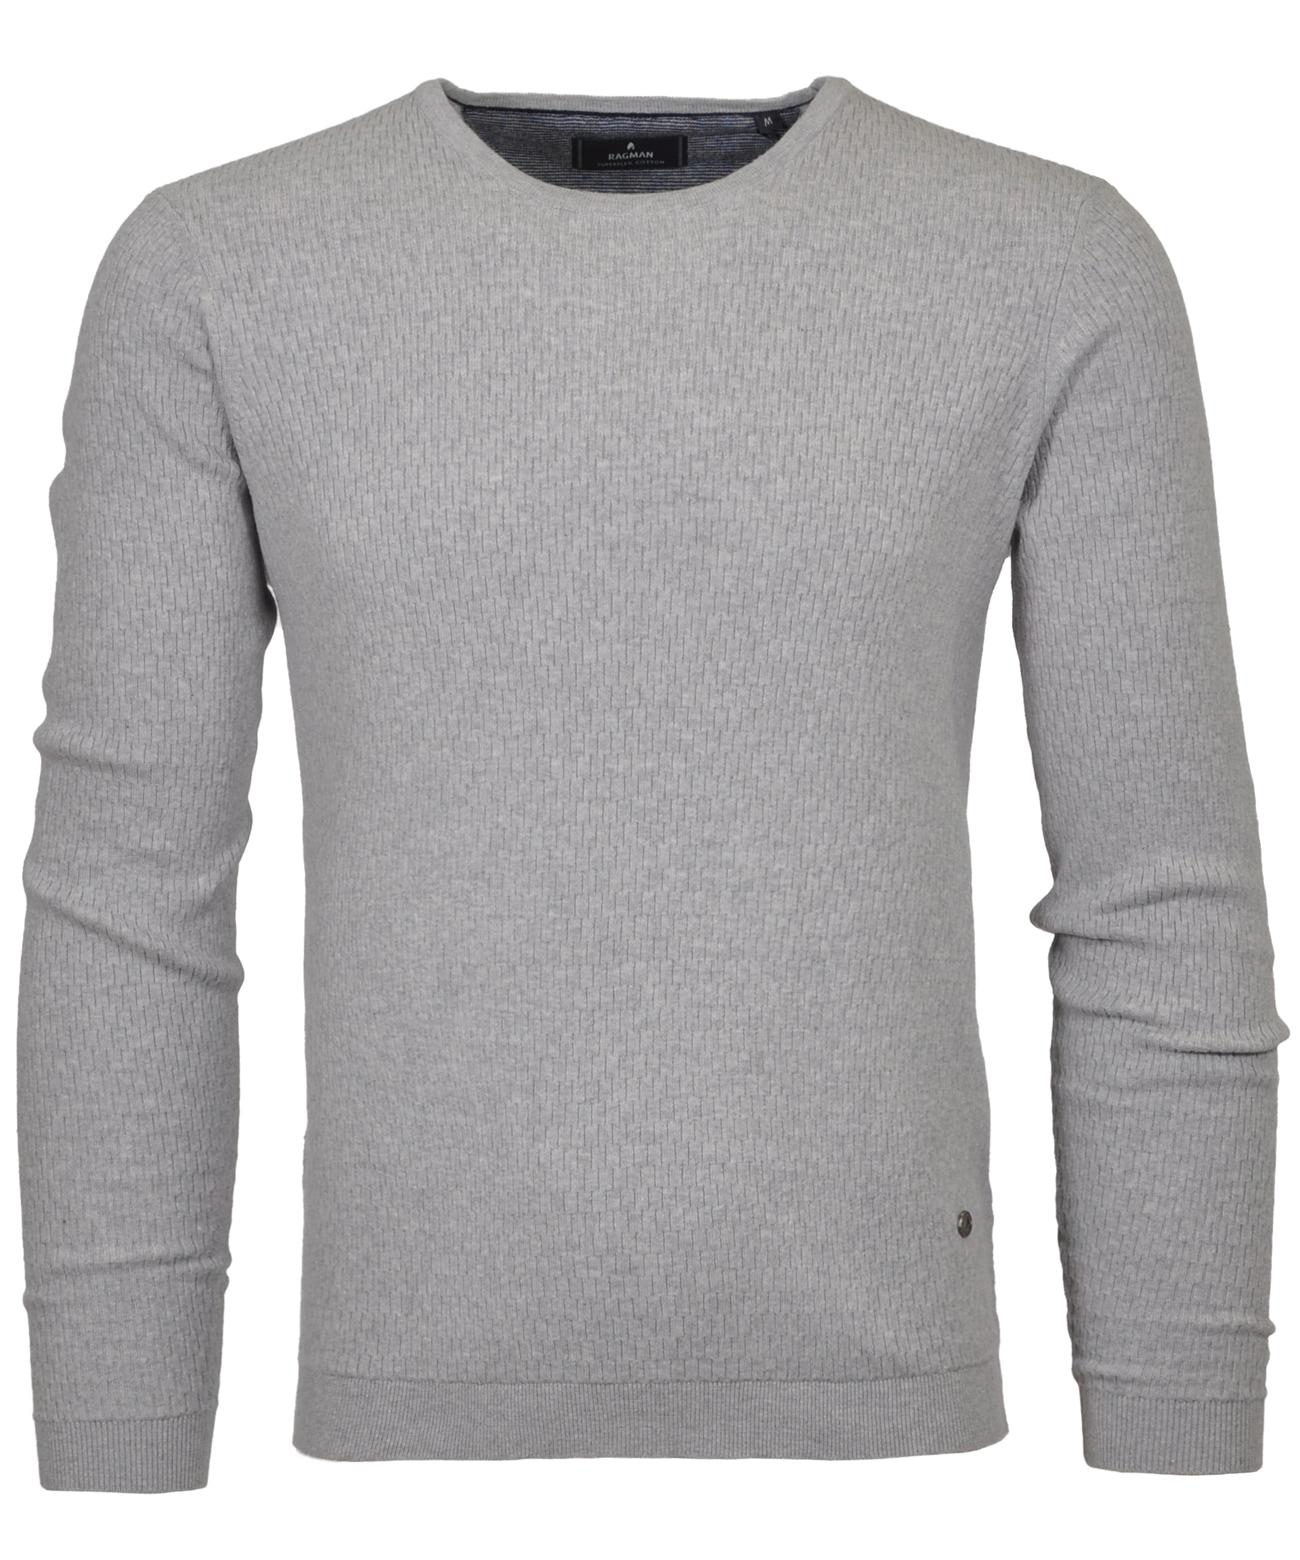 RAGMAN Rundhalspullover | Bekleidung > Pullover | Ragman